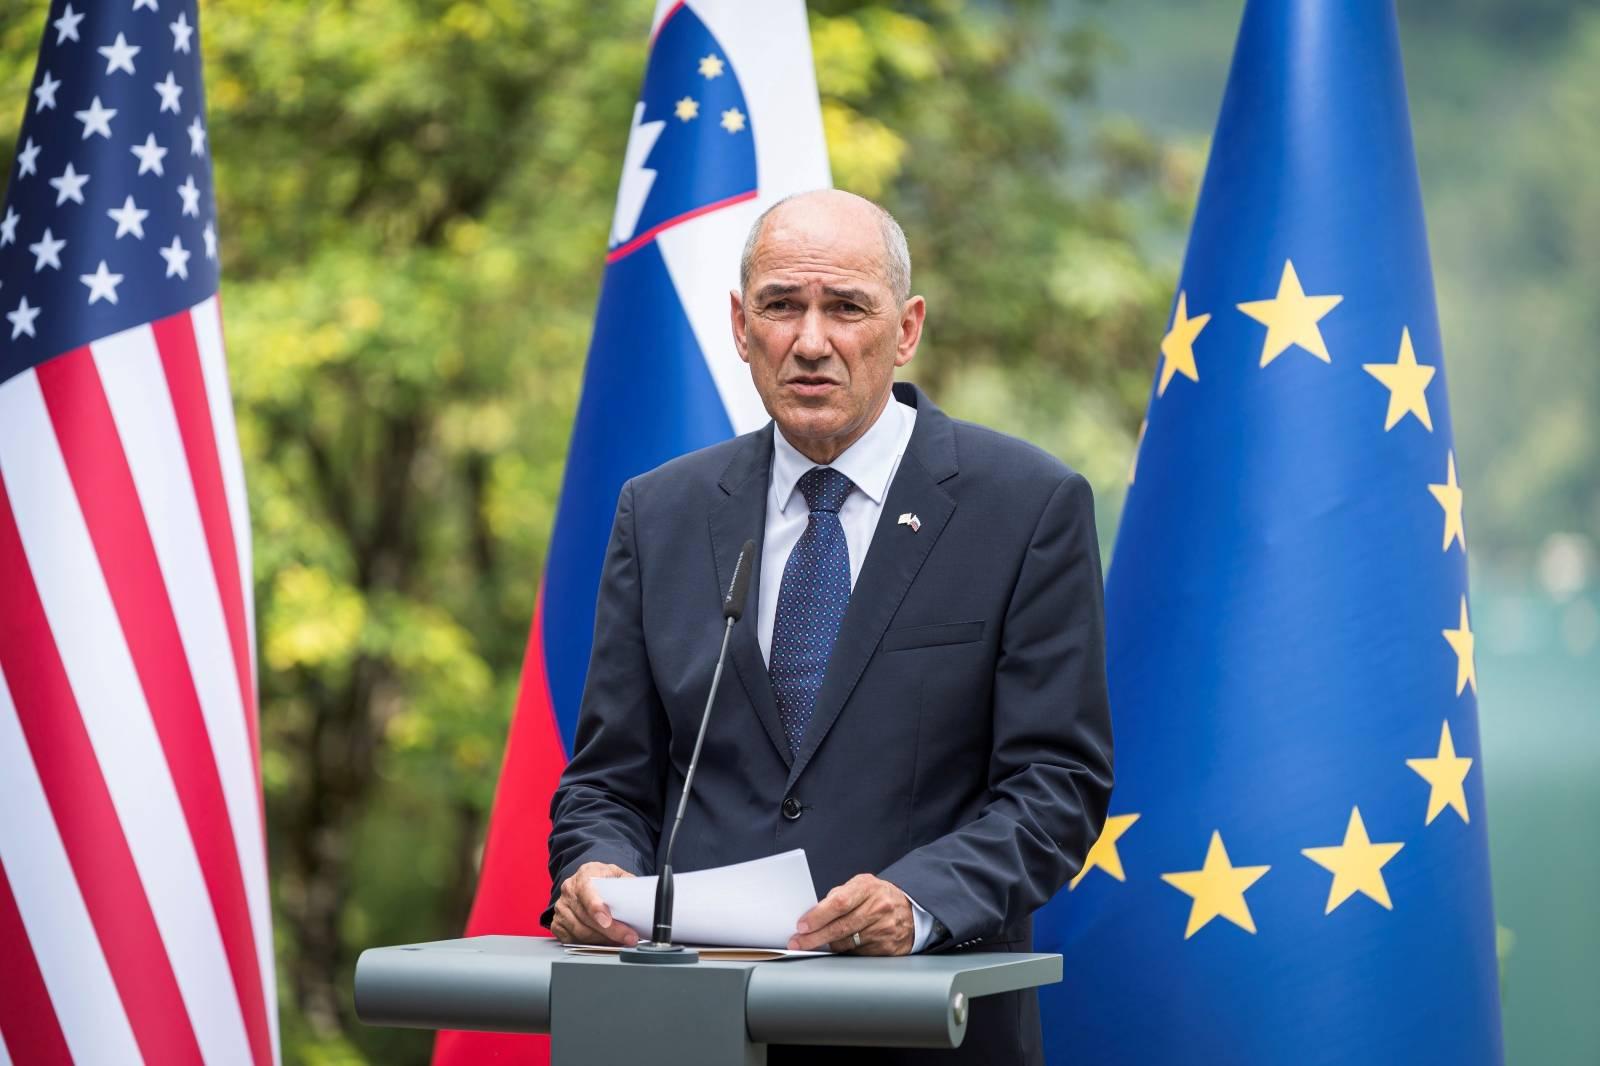 U.S. Secretary of State Pompeo visits in Slovenia